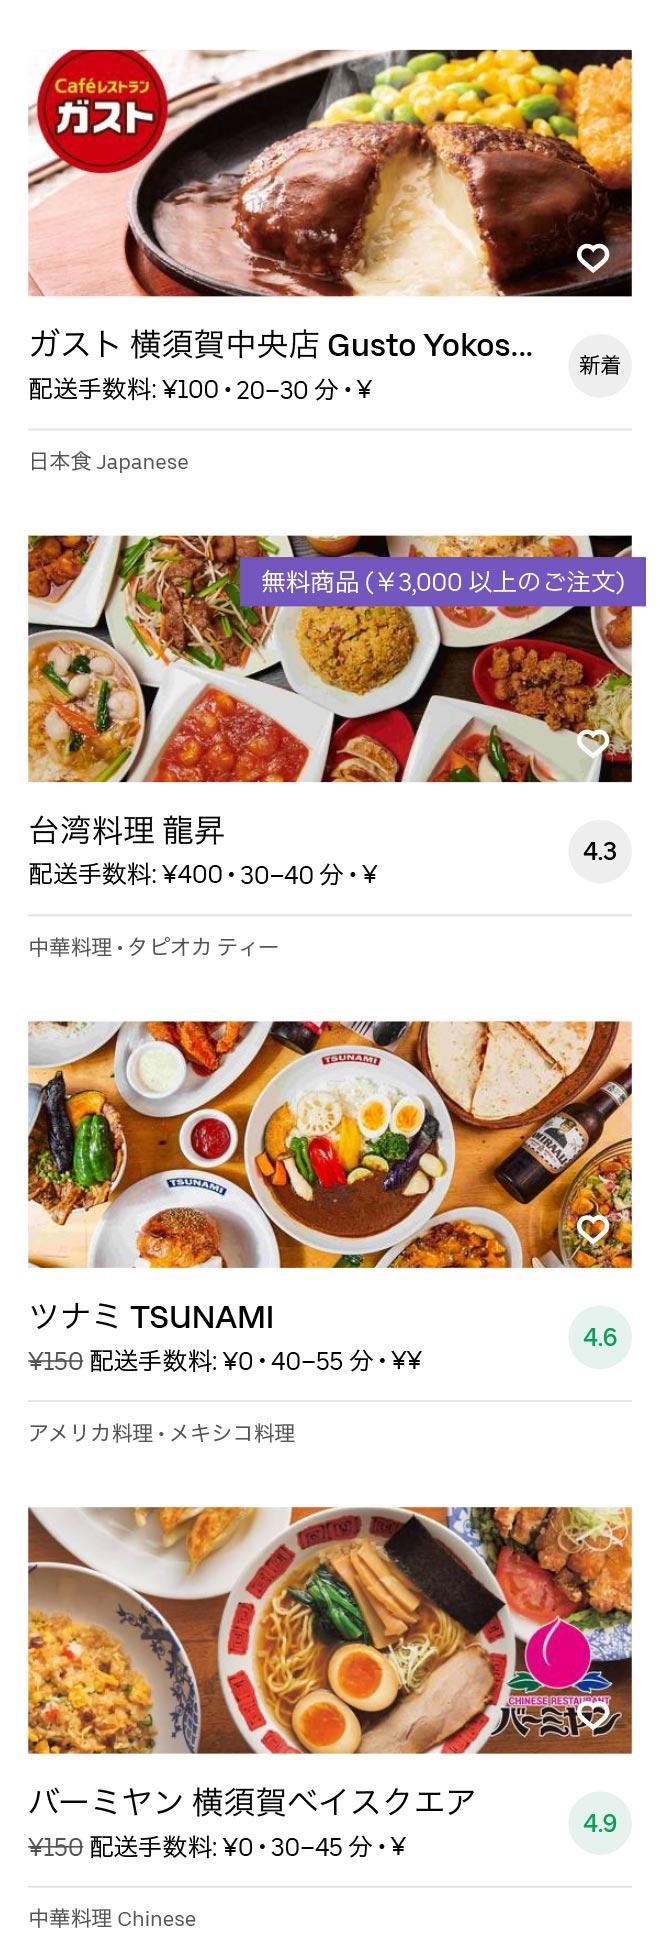 Yokosuka chuo menu 2008 04